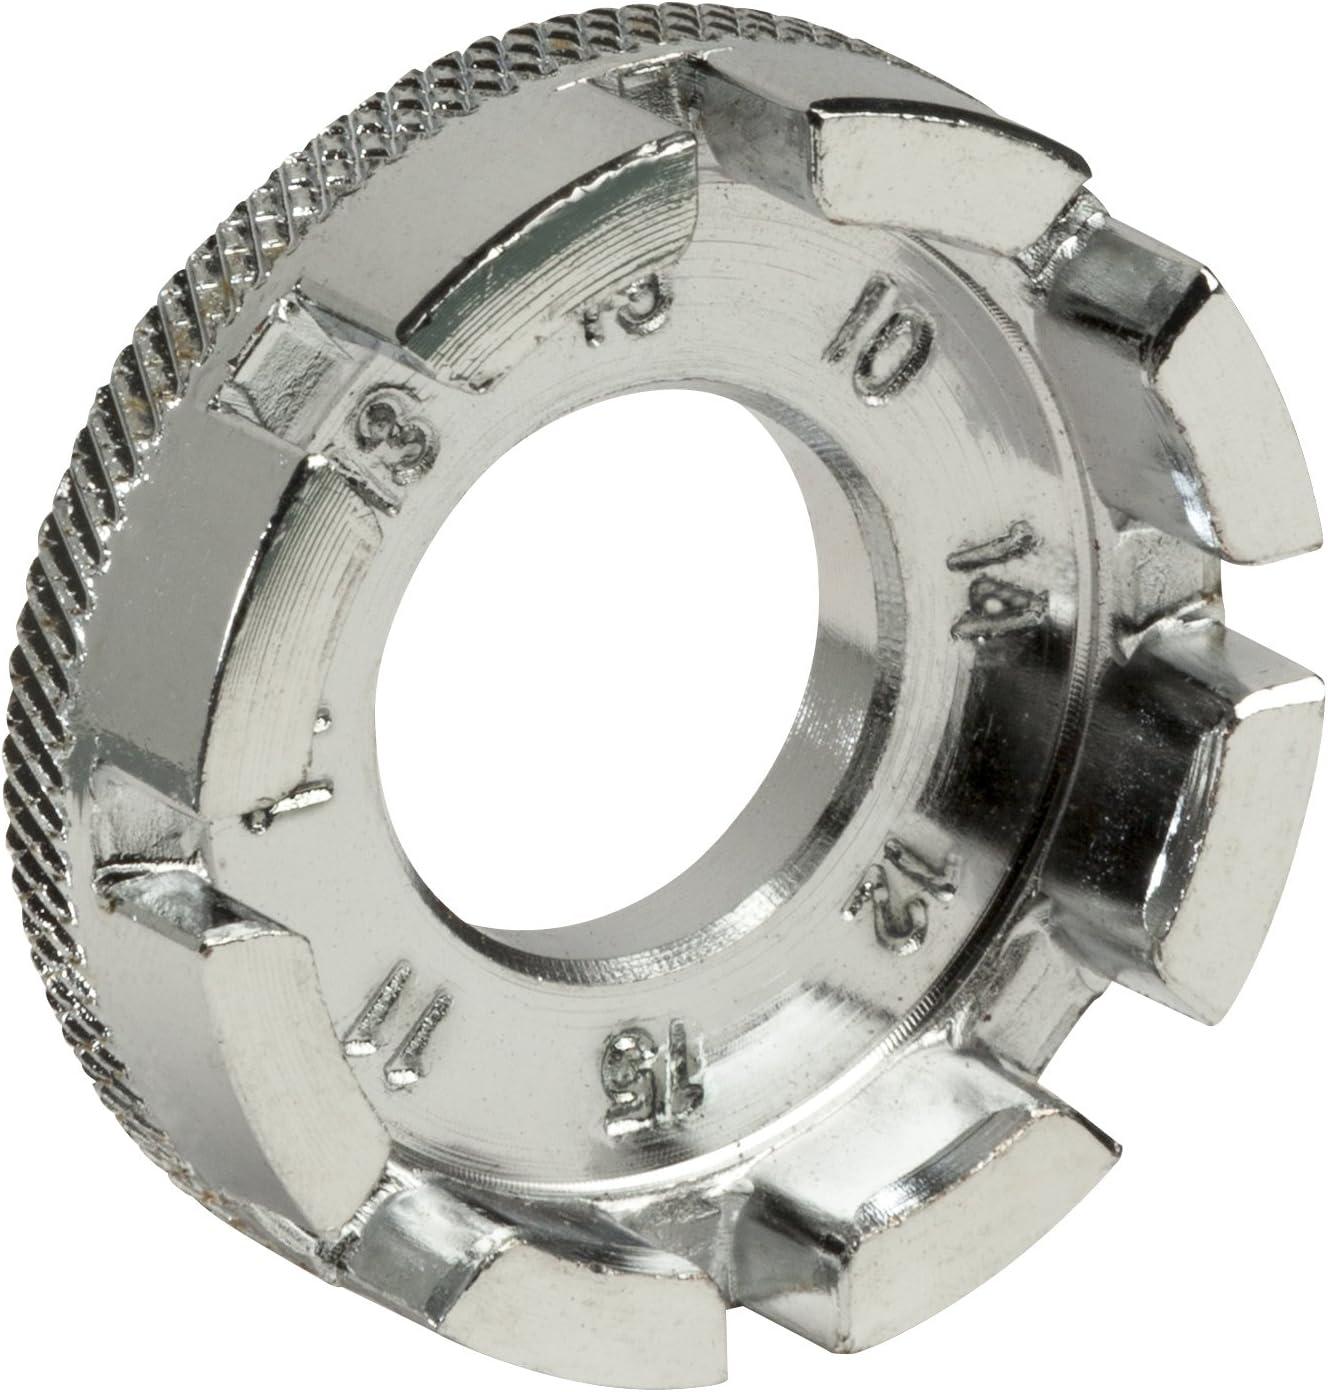 Bike Spoke Key Wheel Spoke Wrench Tool Nipples  Bike Accessories Durable $T